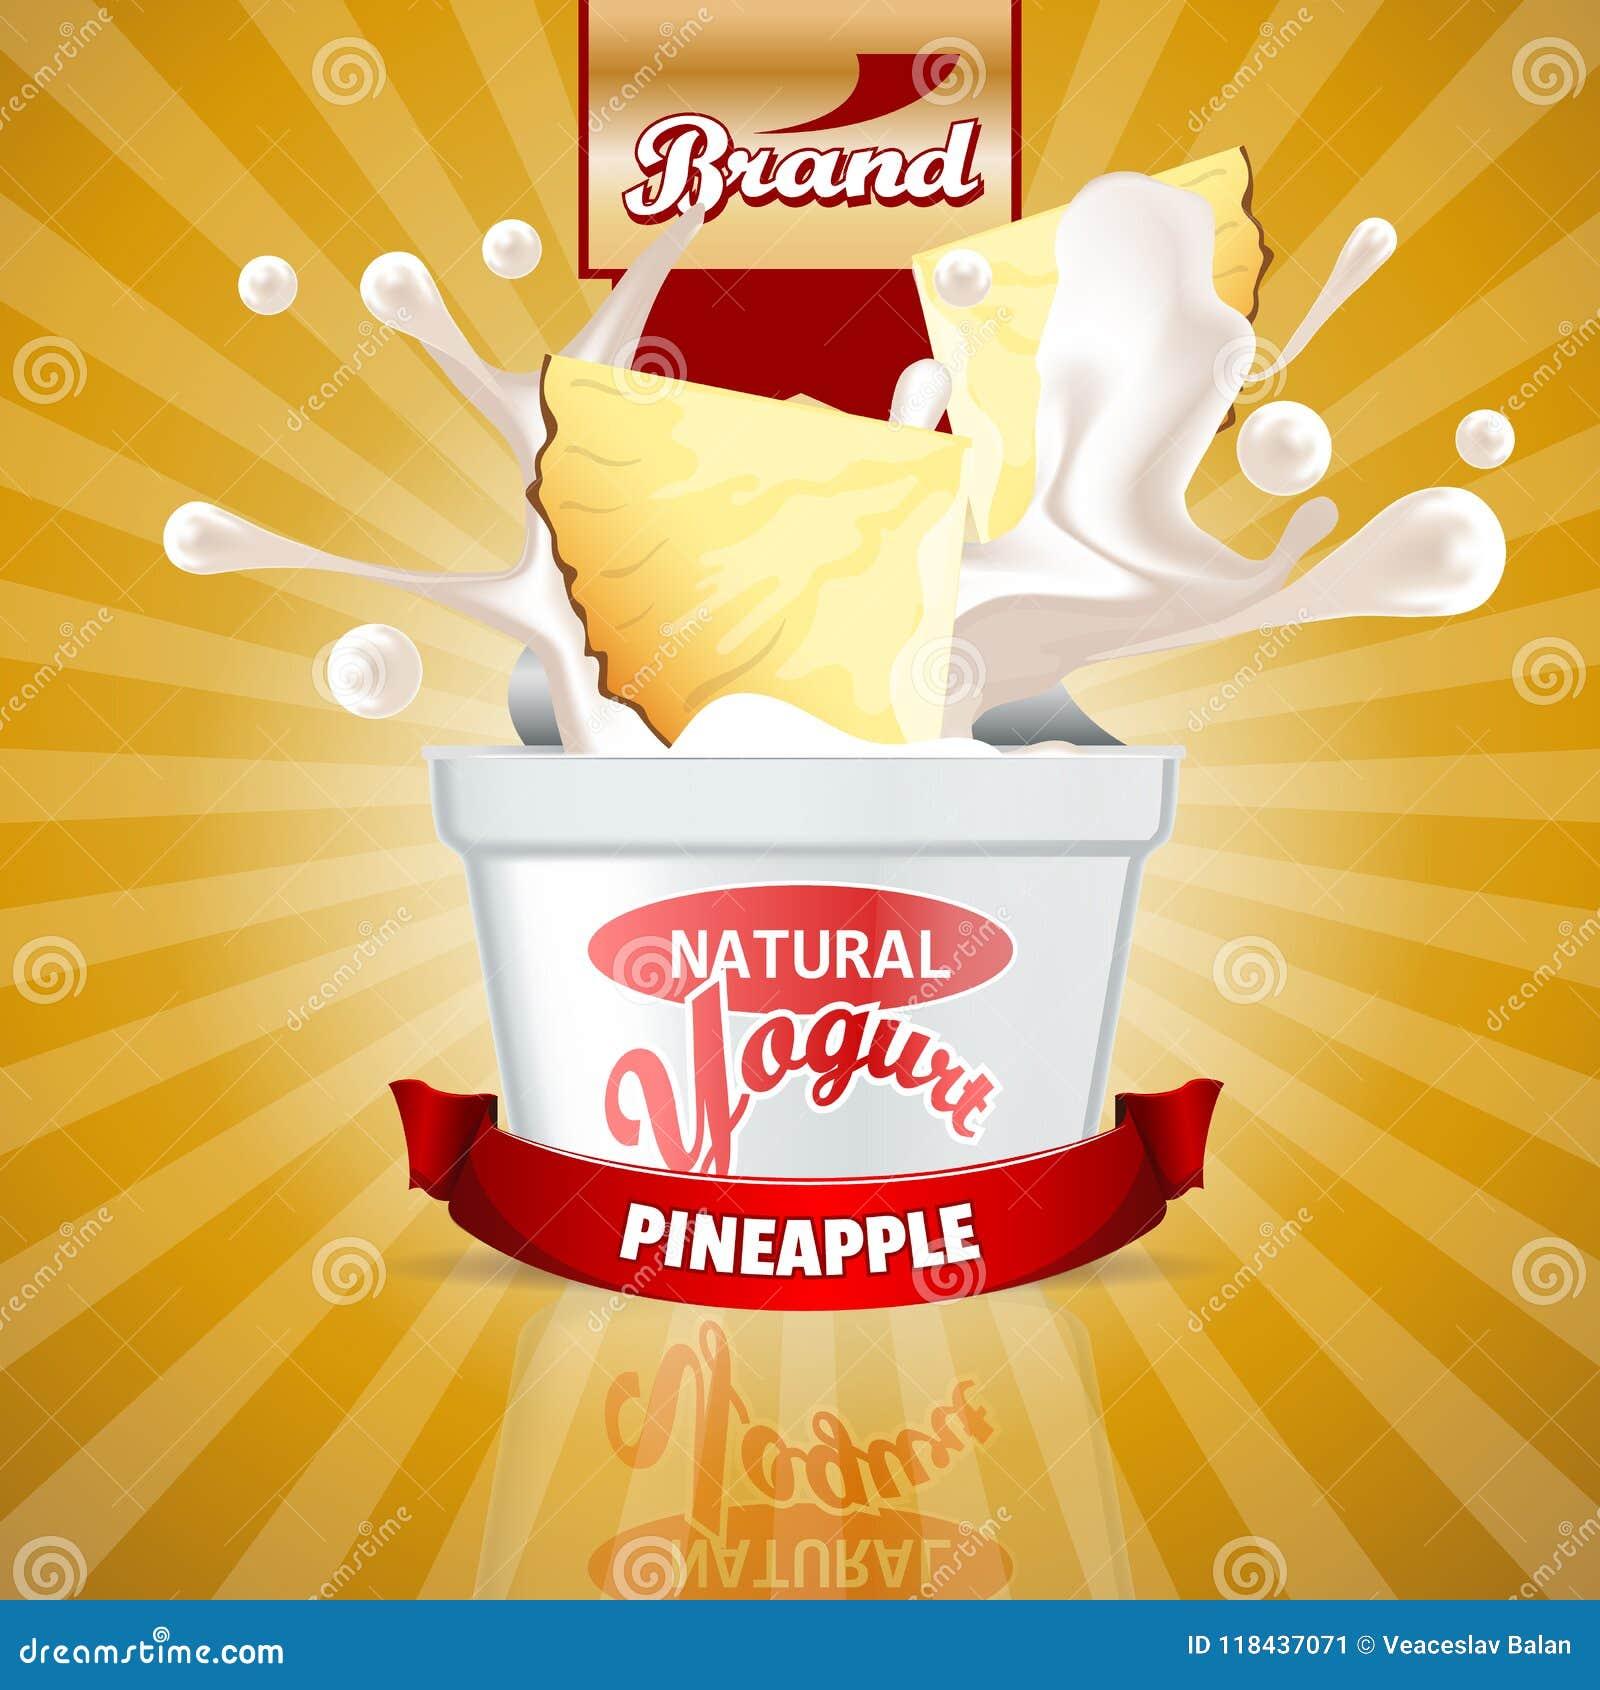 pineapple yogurt ads splashing scene with package and fruits